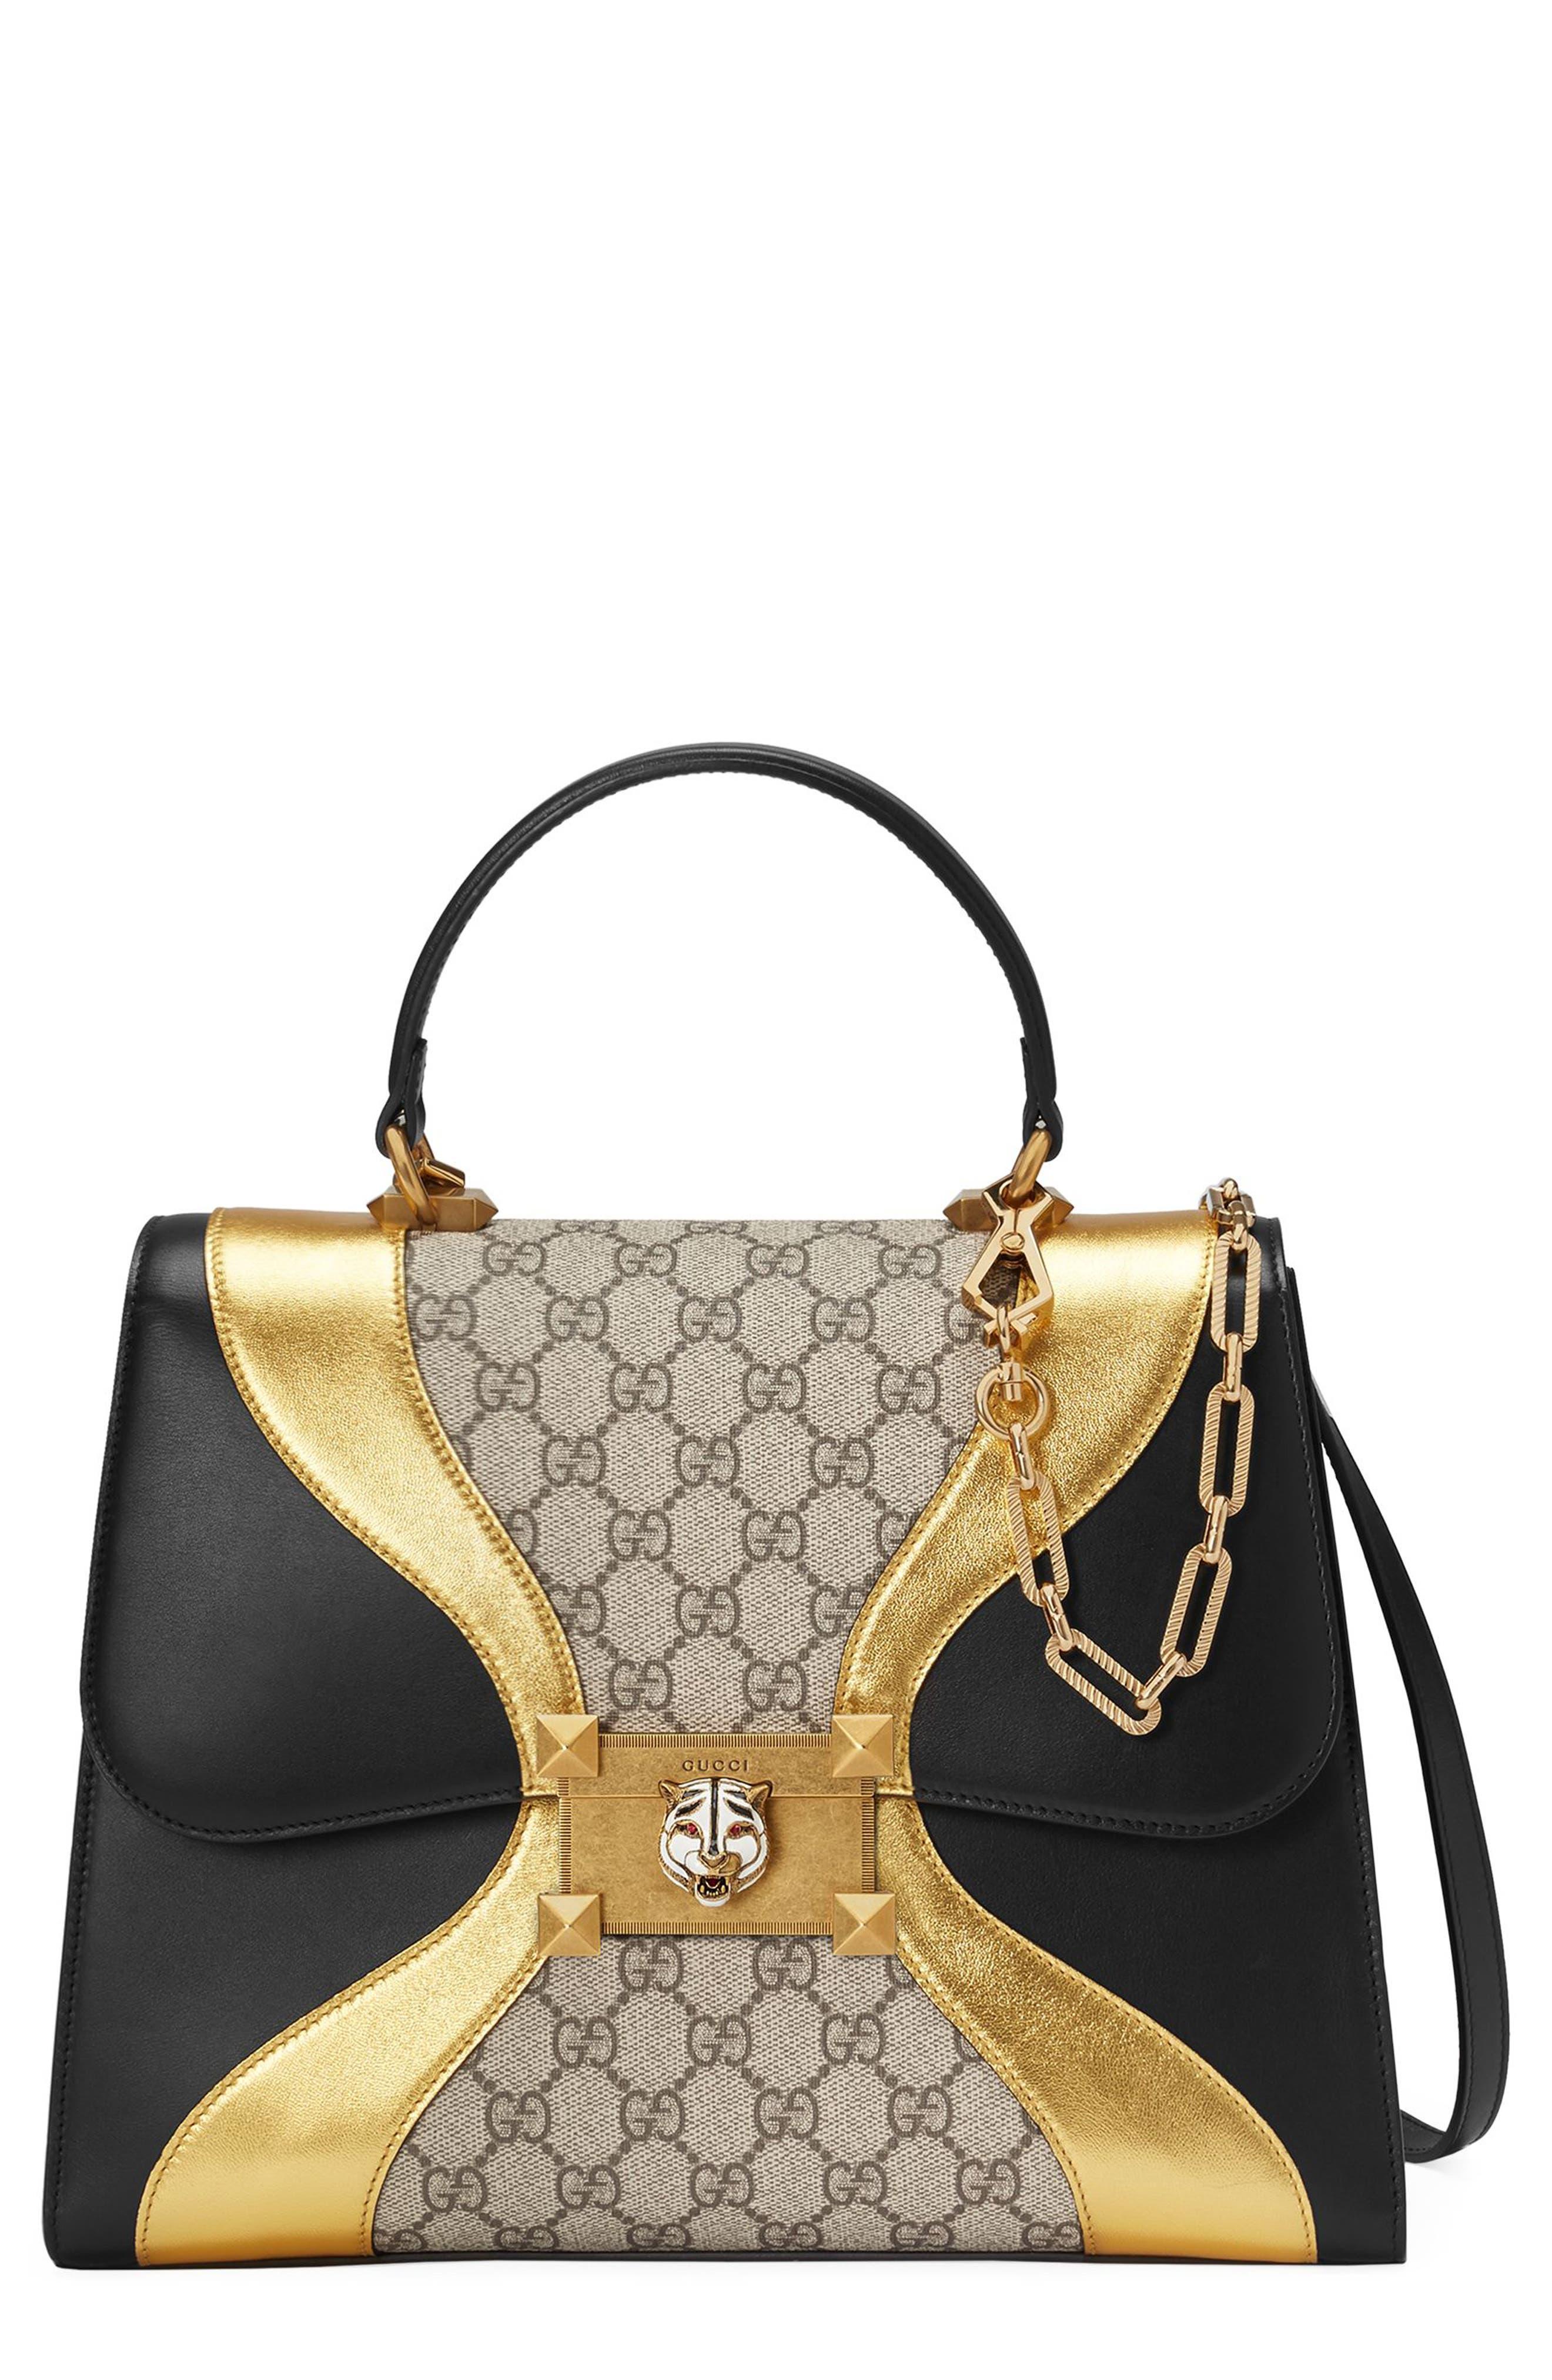 Main Image - Gucci Osiride Top Handle GG Supreme & Leather Satchel